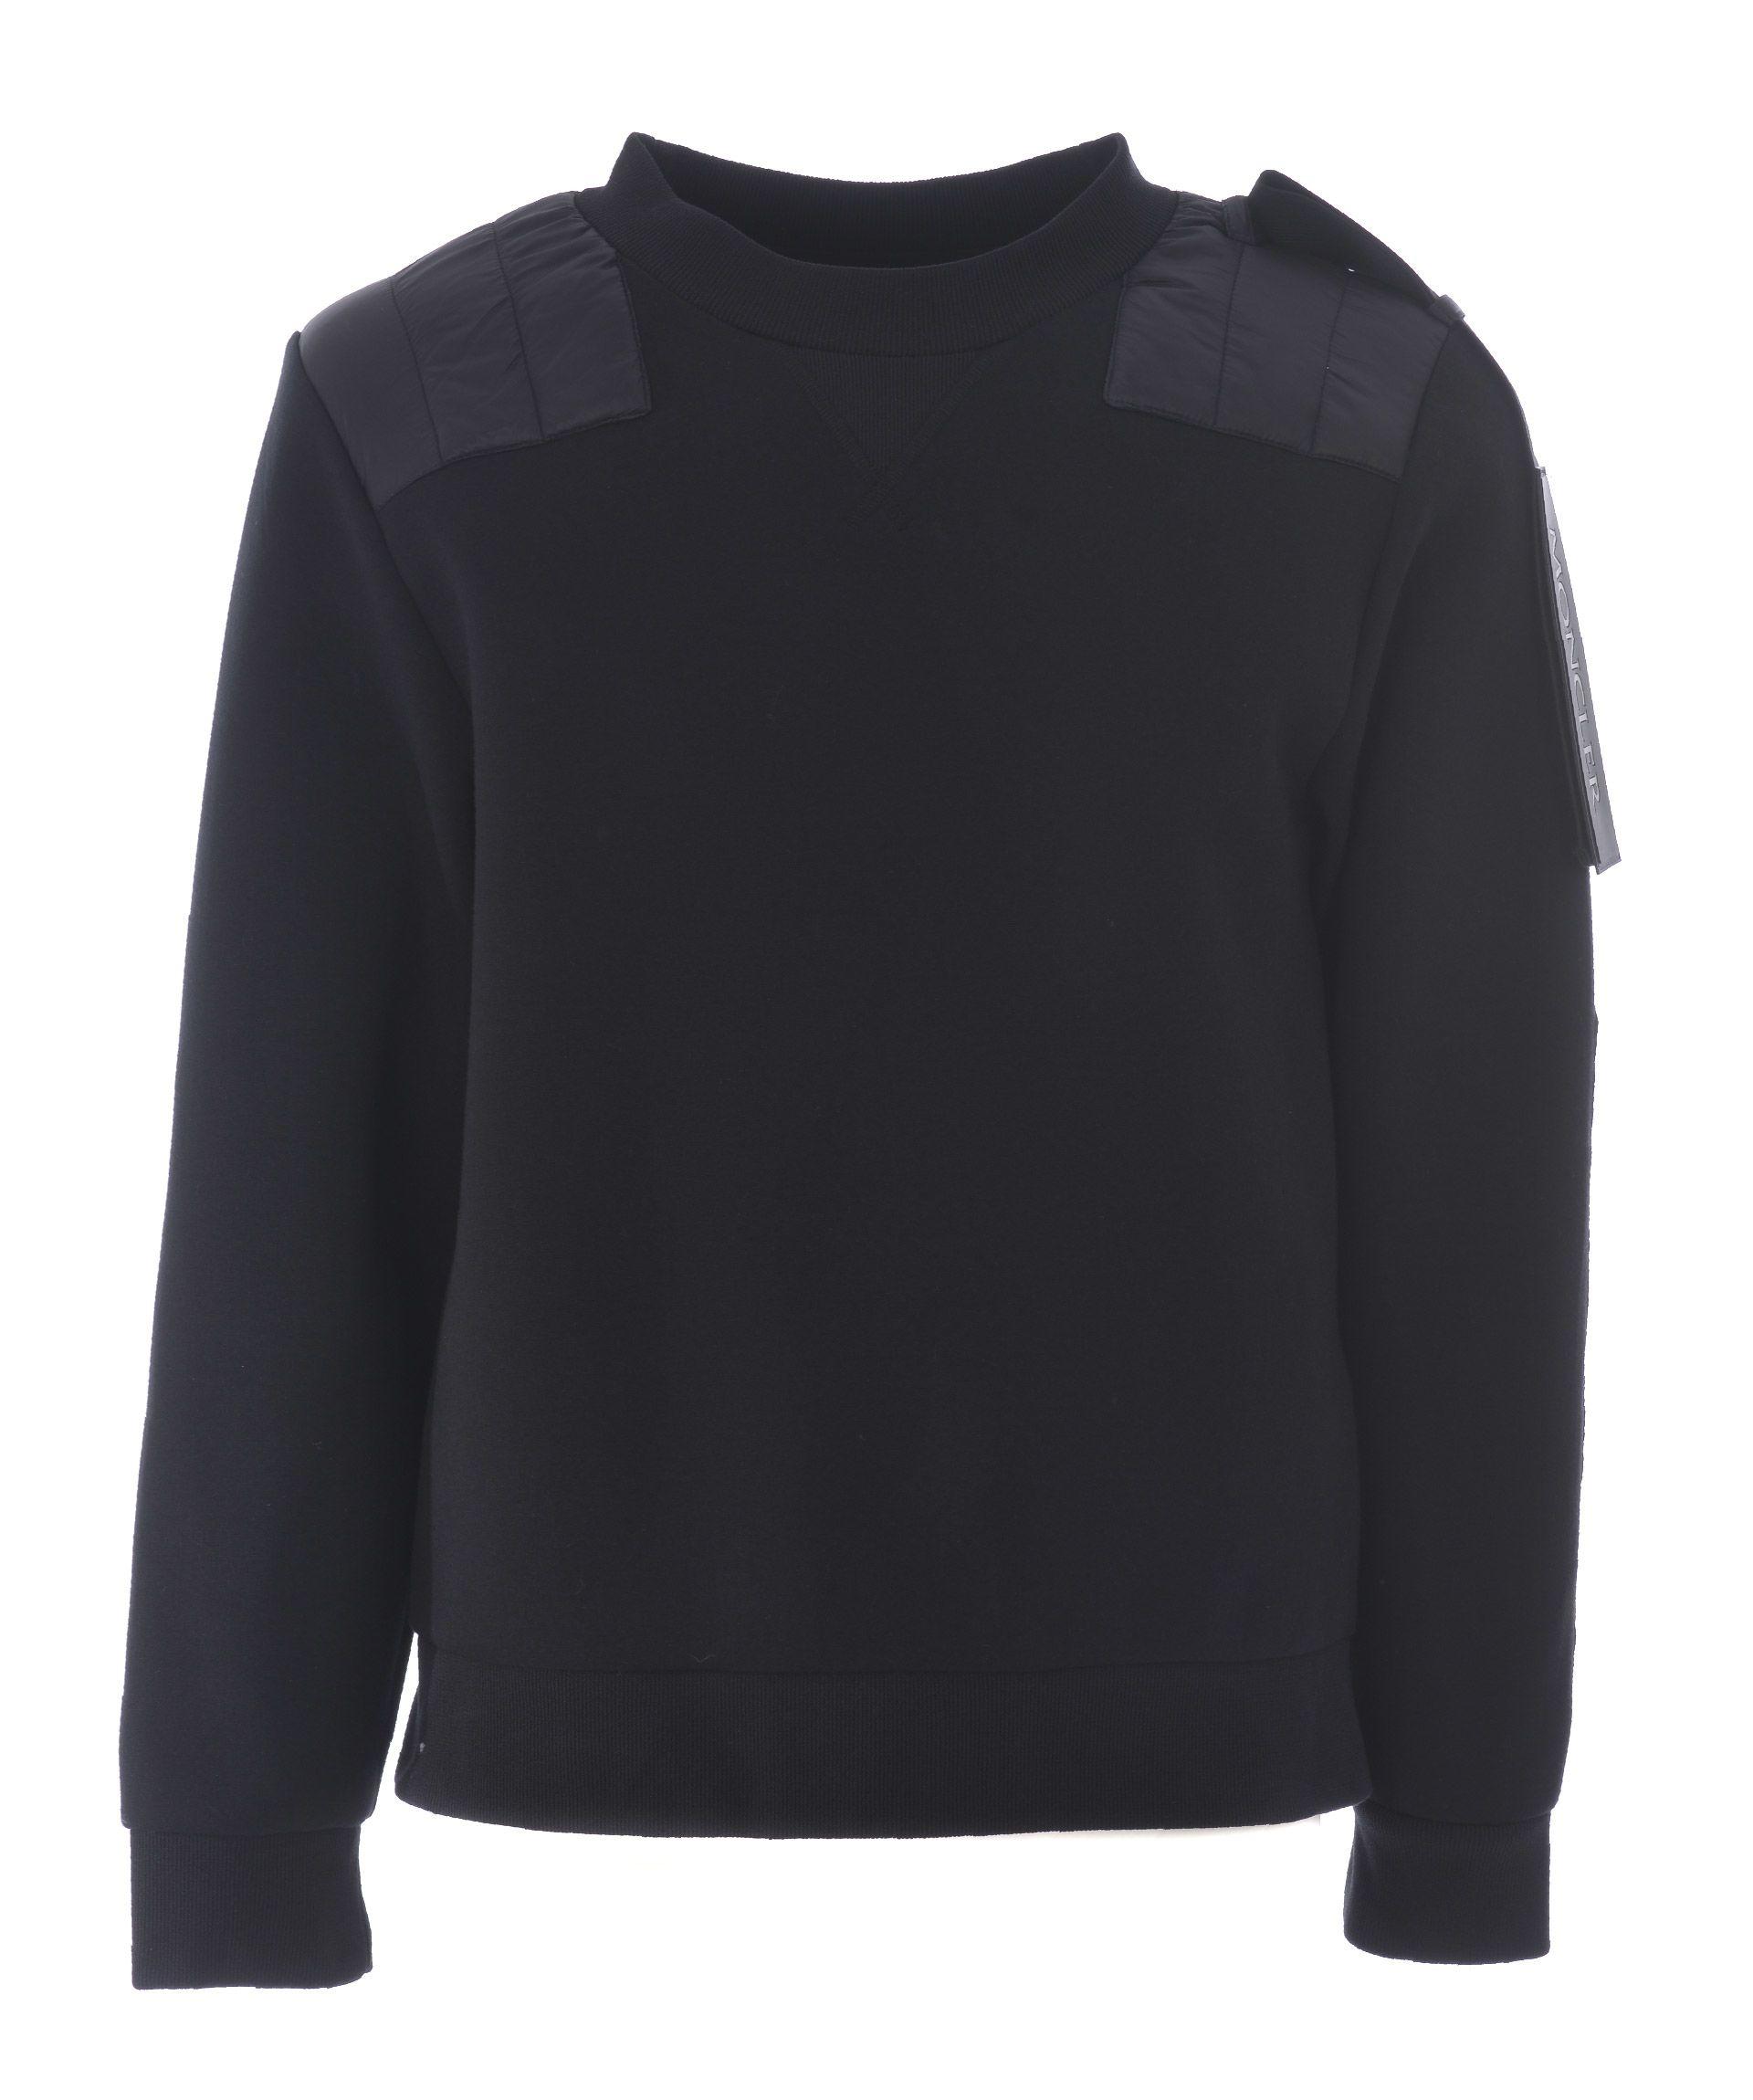 Moncler Capsule Padded Sweatshirt